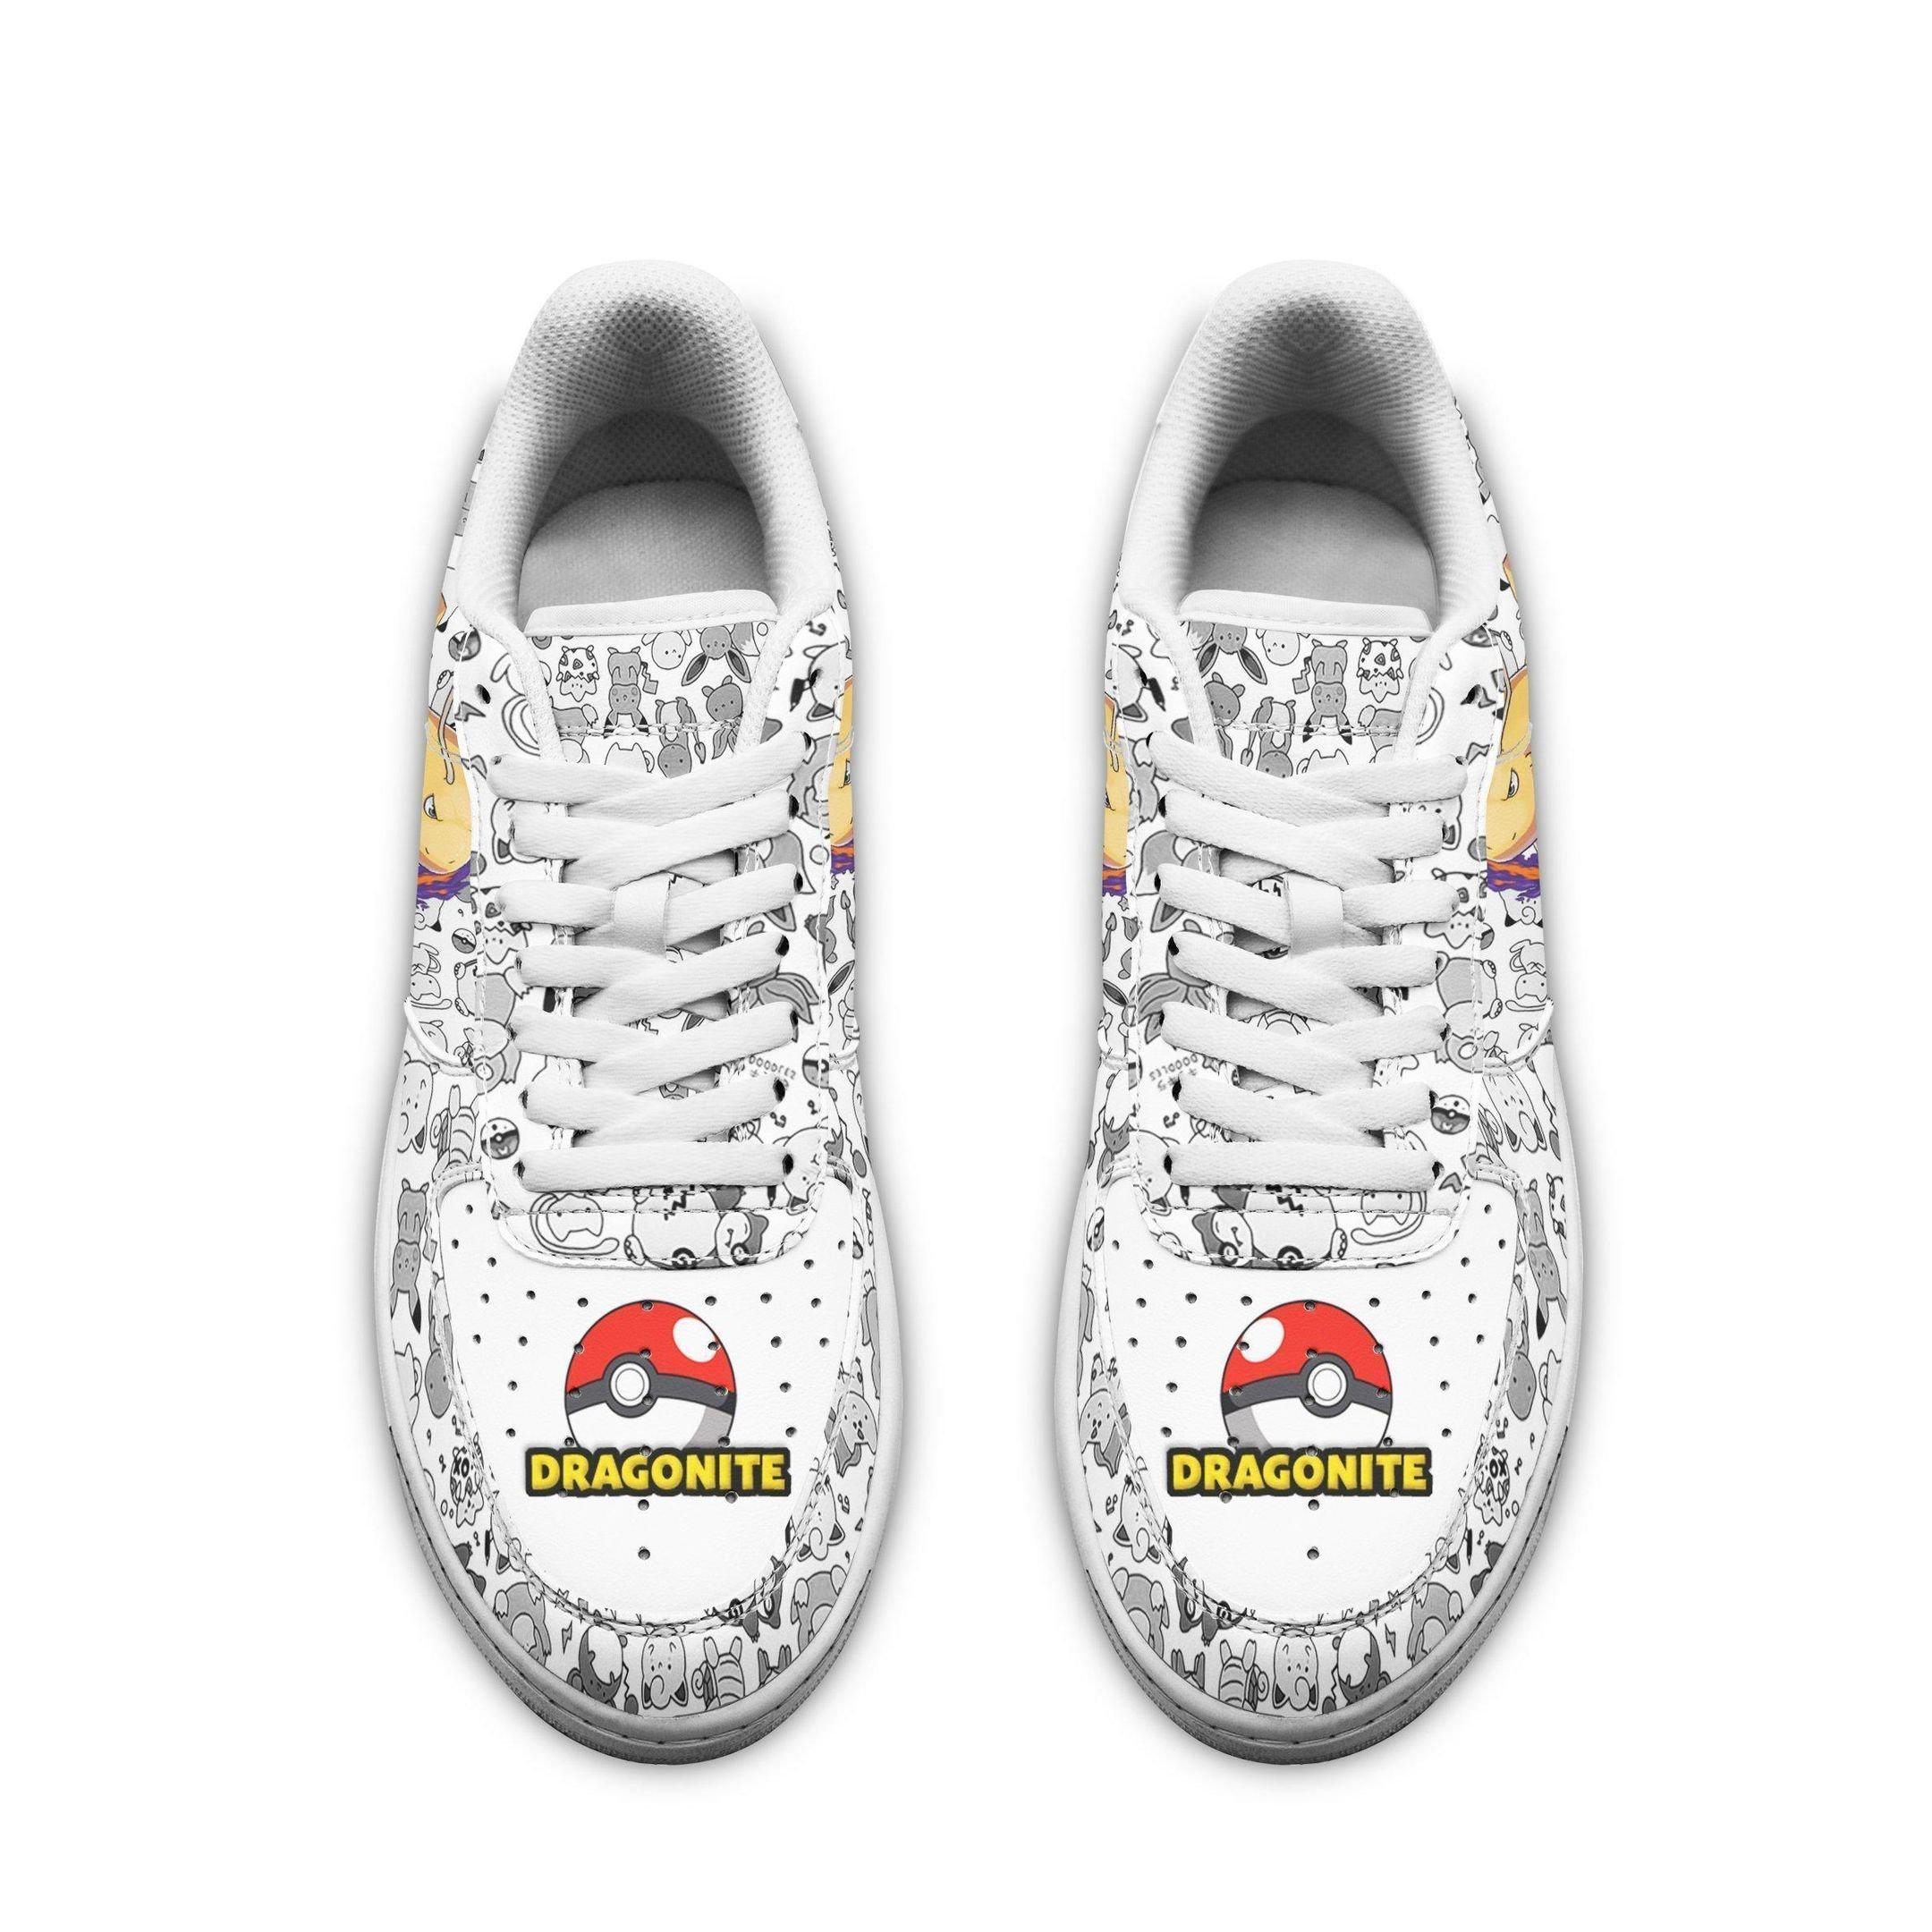 Dragonite Air Shoes Pokemon Shoes Fan Gift Idea GO1012